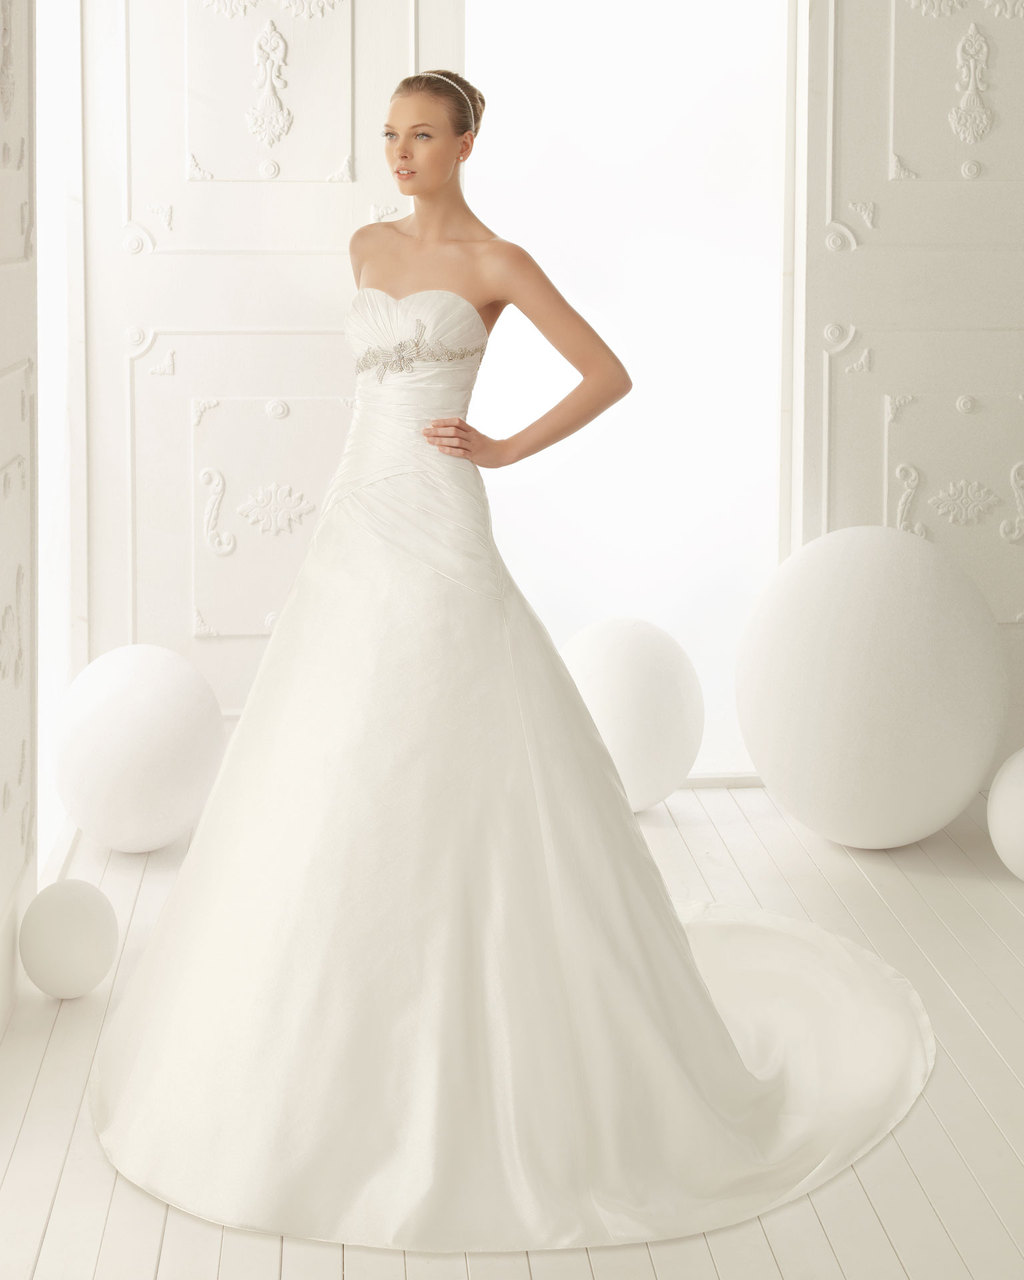 Aire-barcelona-wedding-dress-2013-vintage-bridal-collection-vela.full